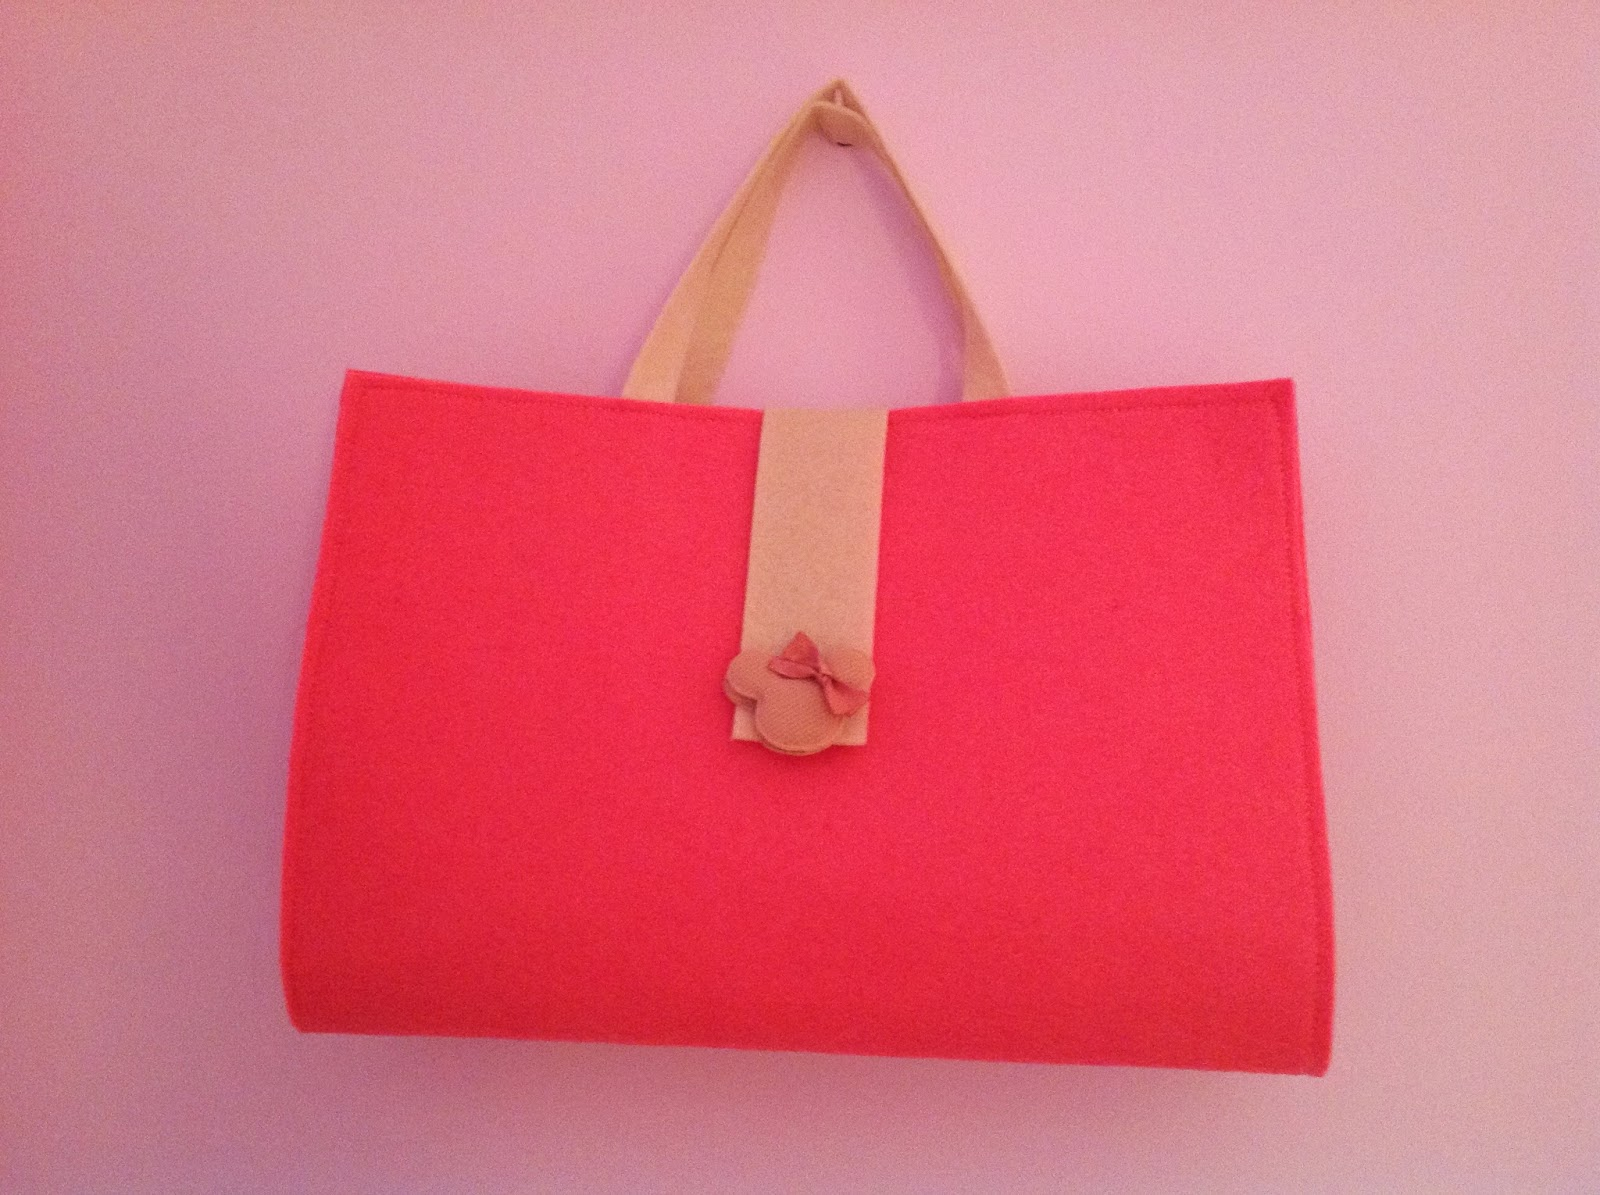 art bag, felt bag, handmade felt